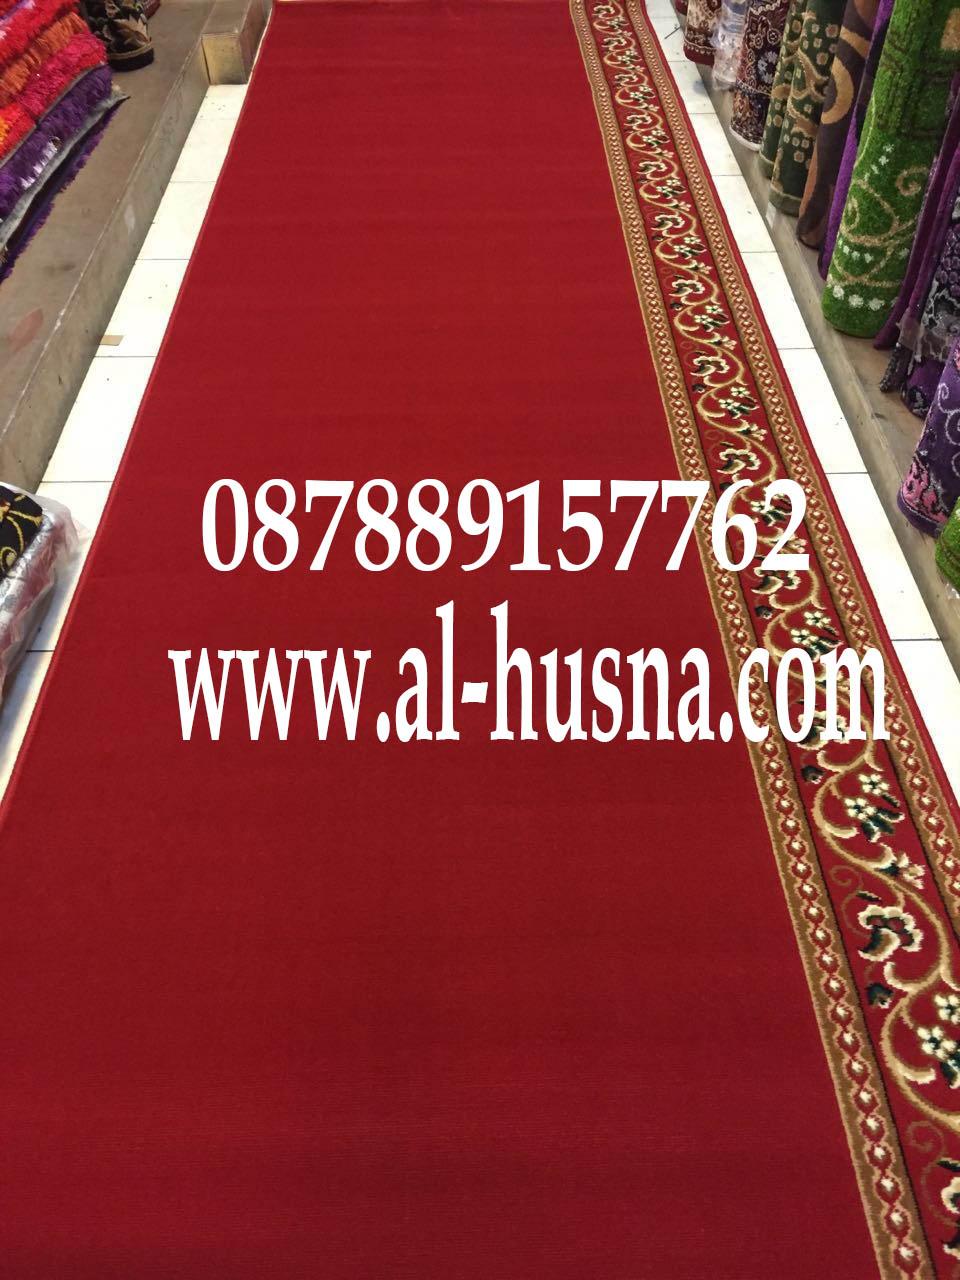 karpet masjid Persian Mosque al husna tanpa harga